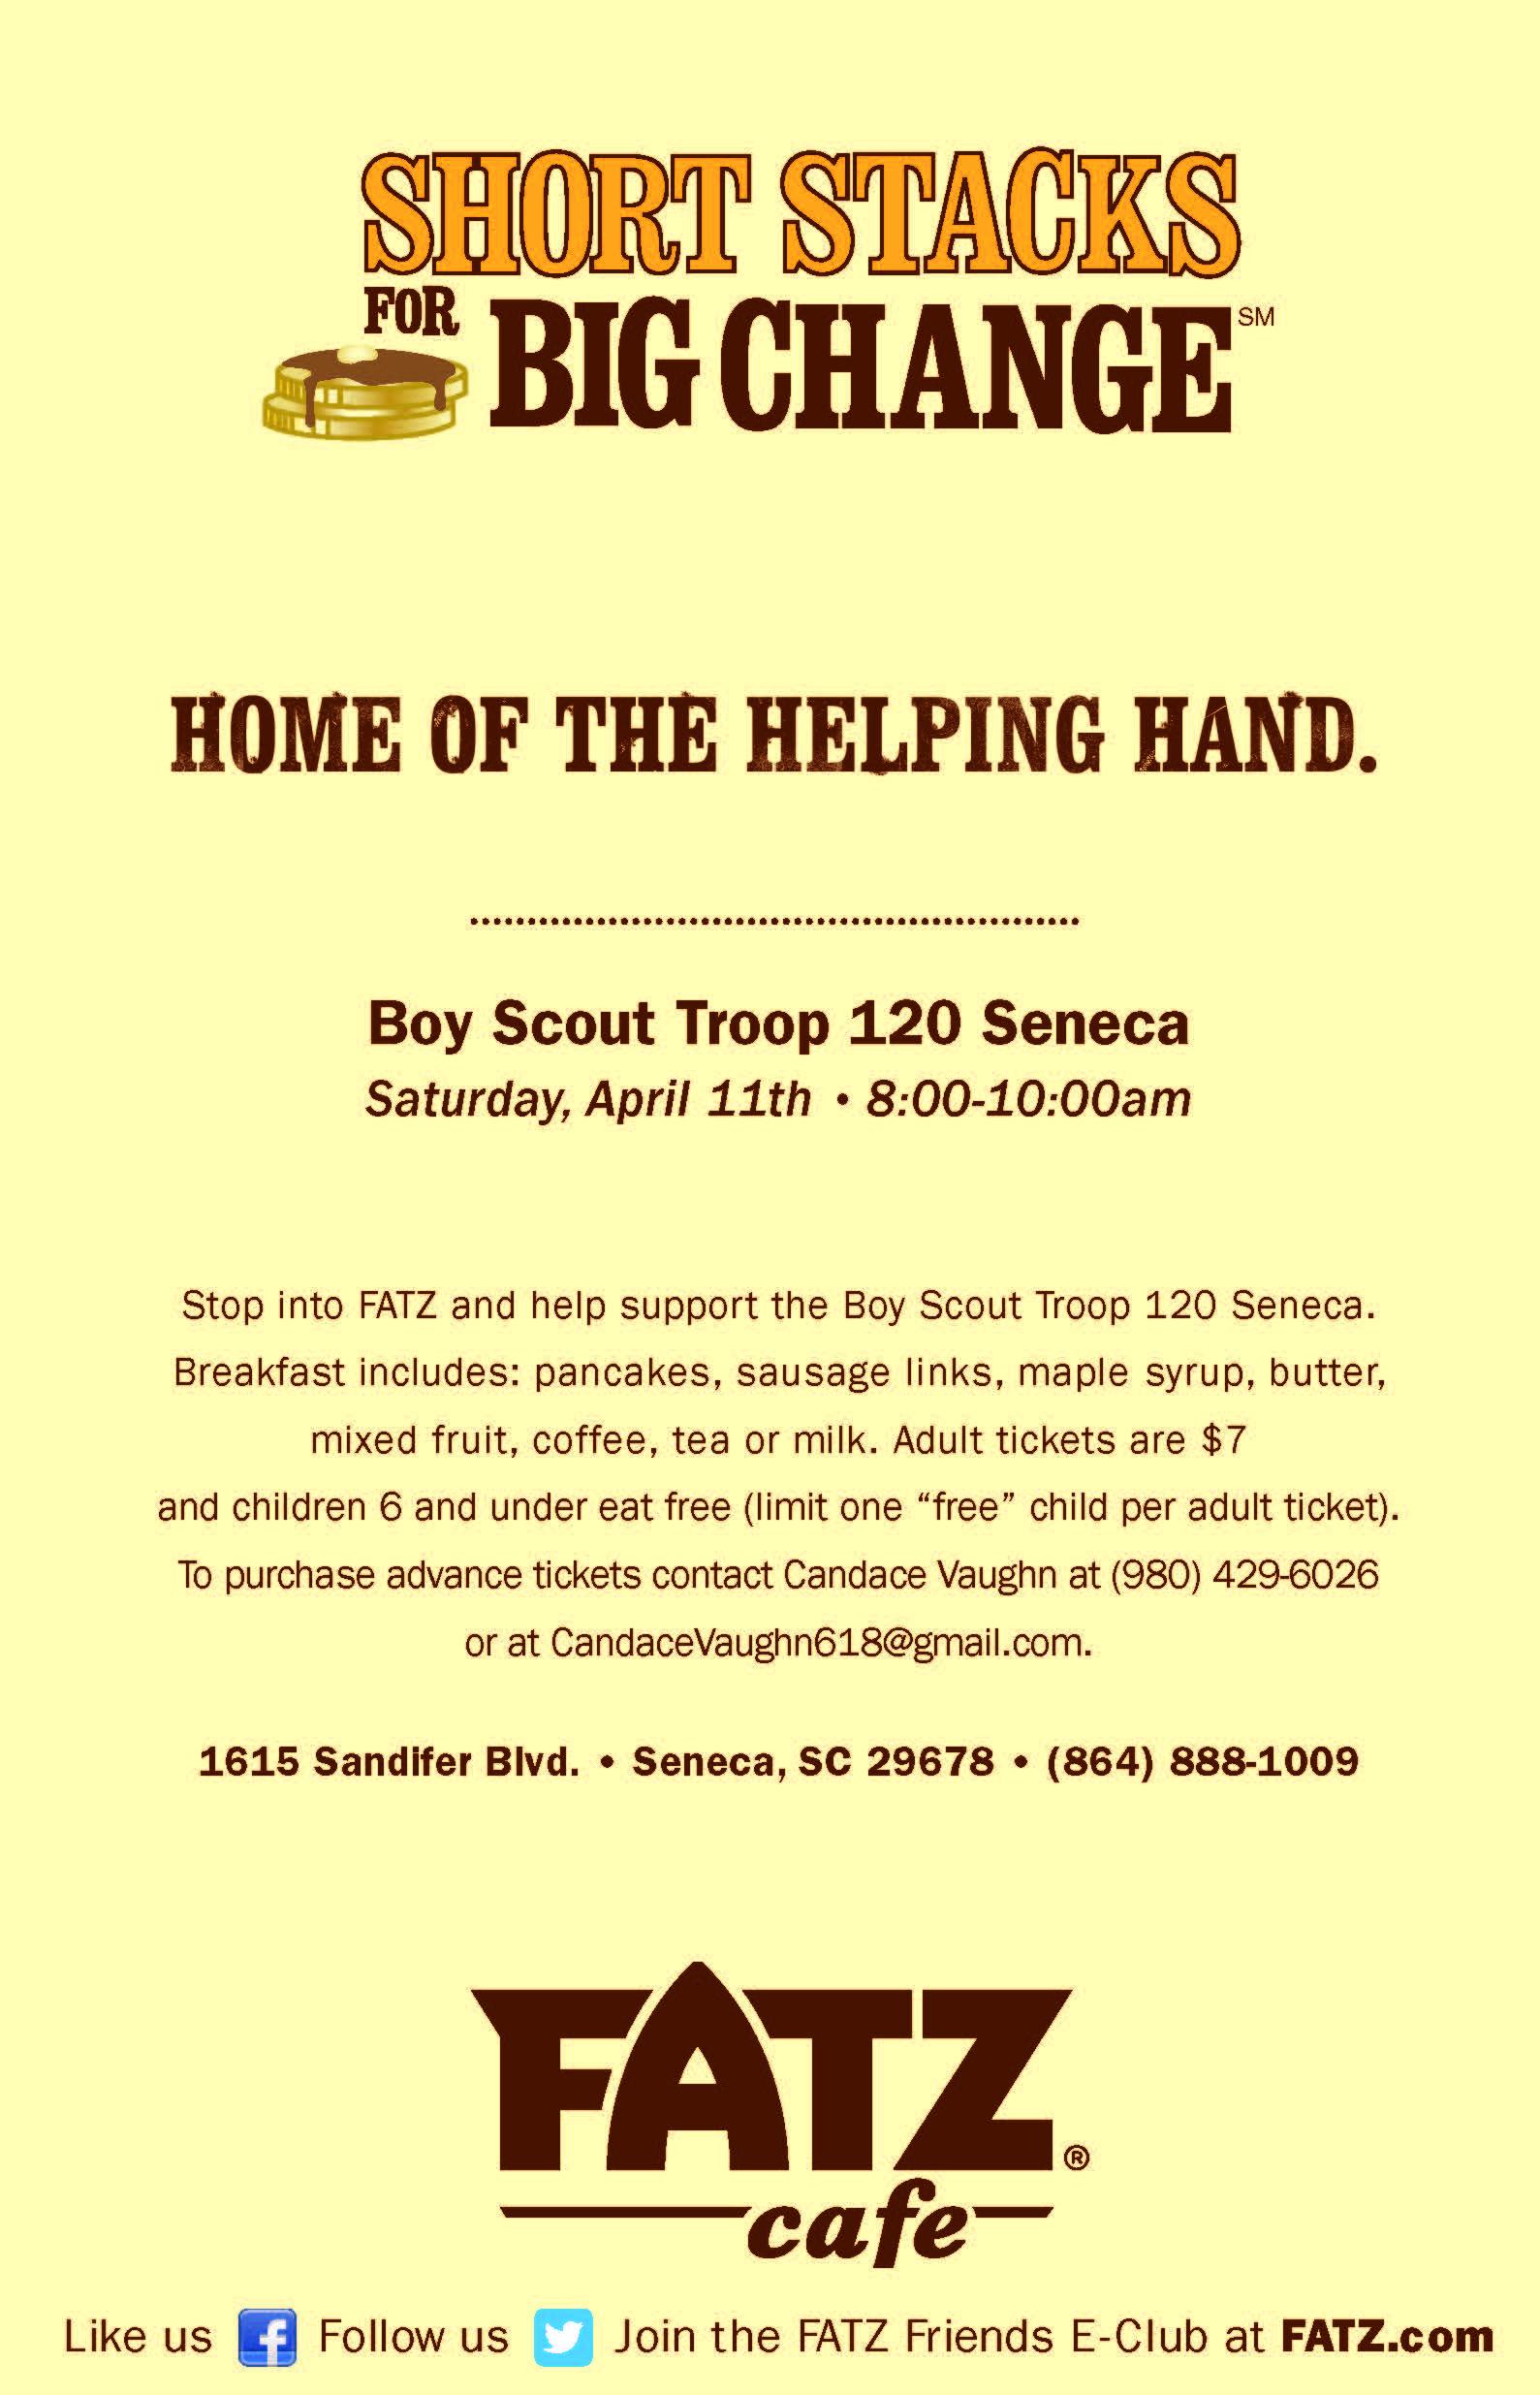 Boy Scout Troop 120 Seneca_flyer